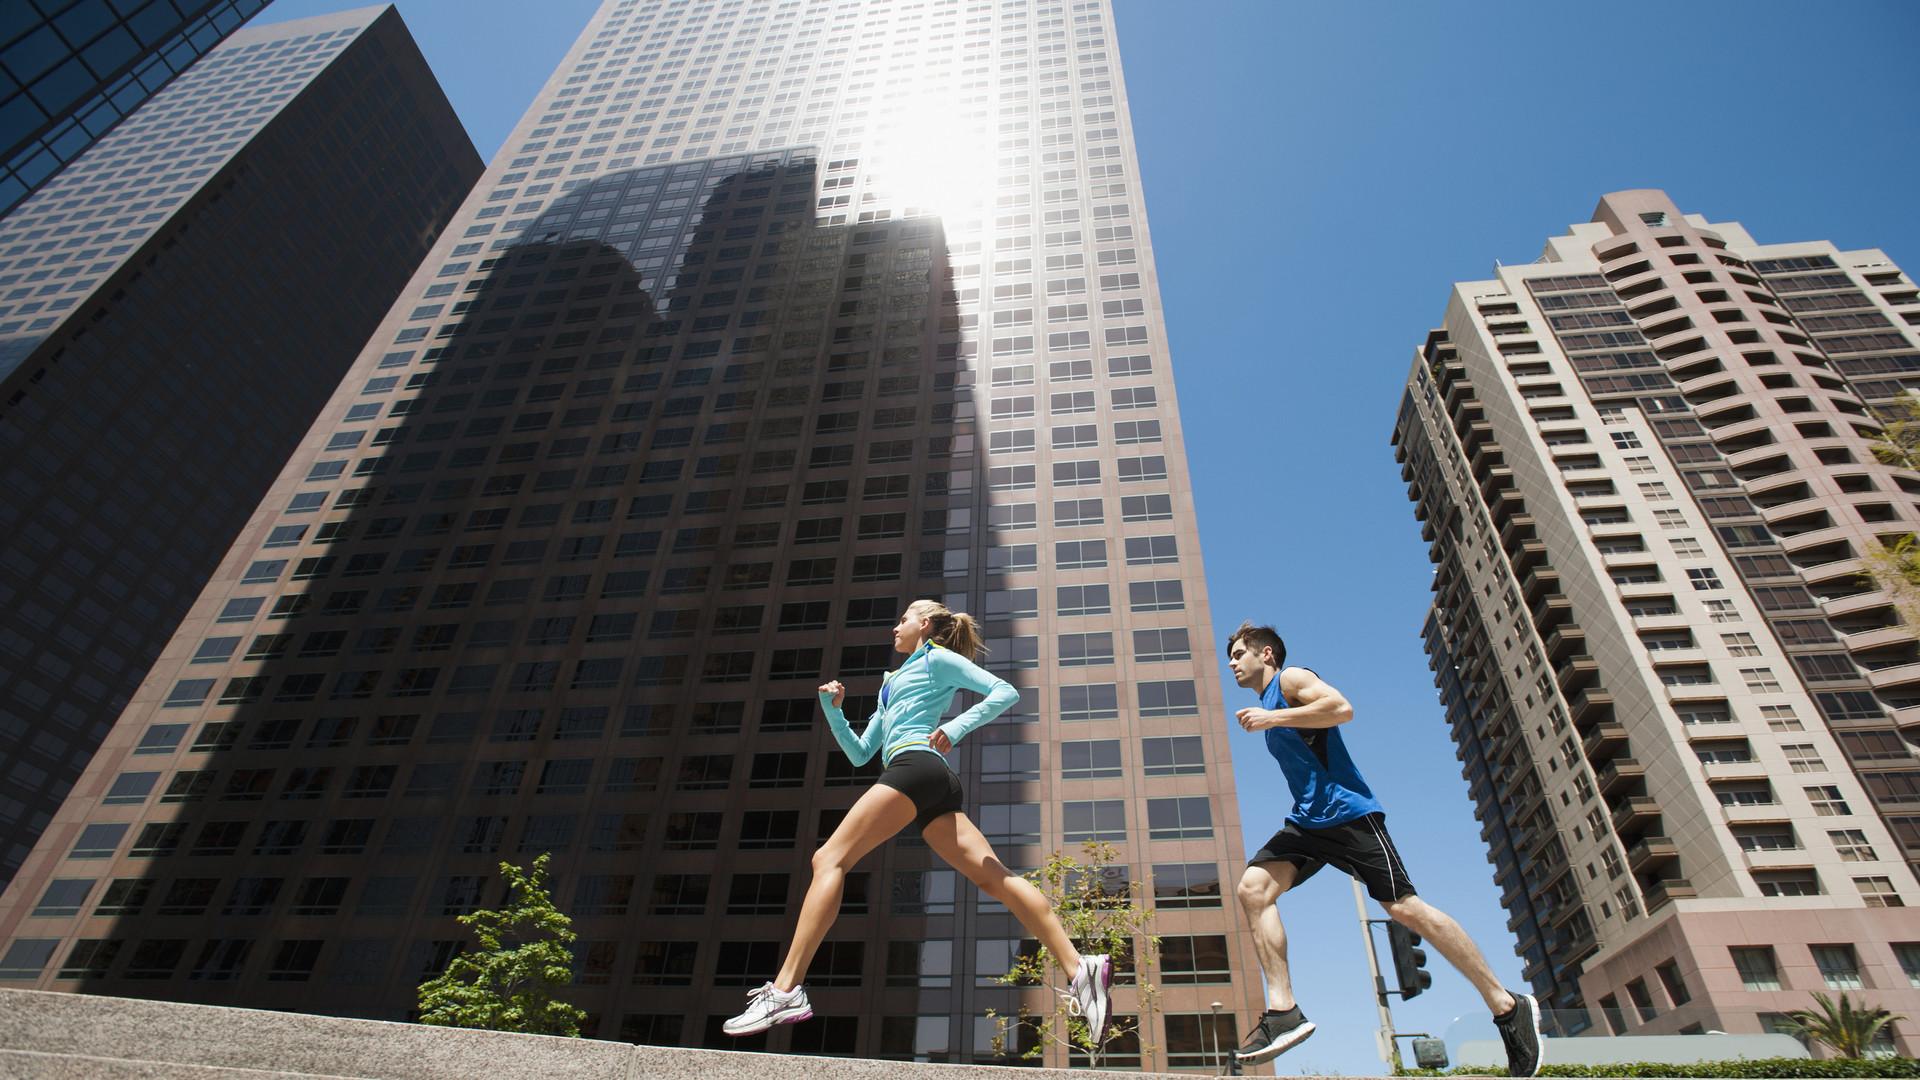 People, Humans, Running, Urban